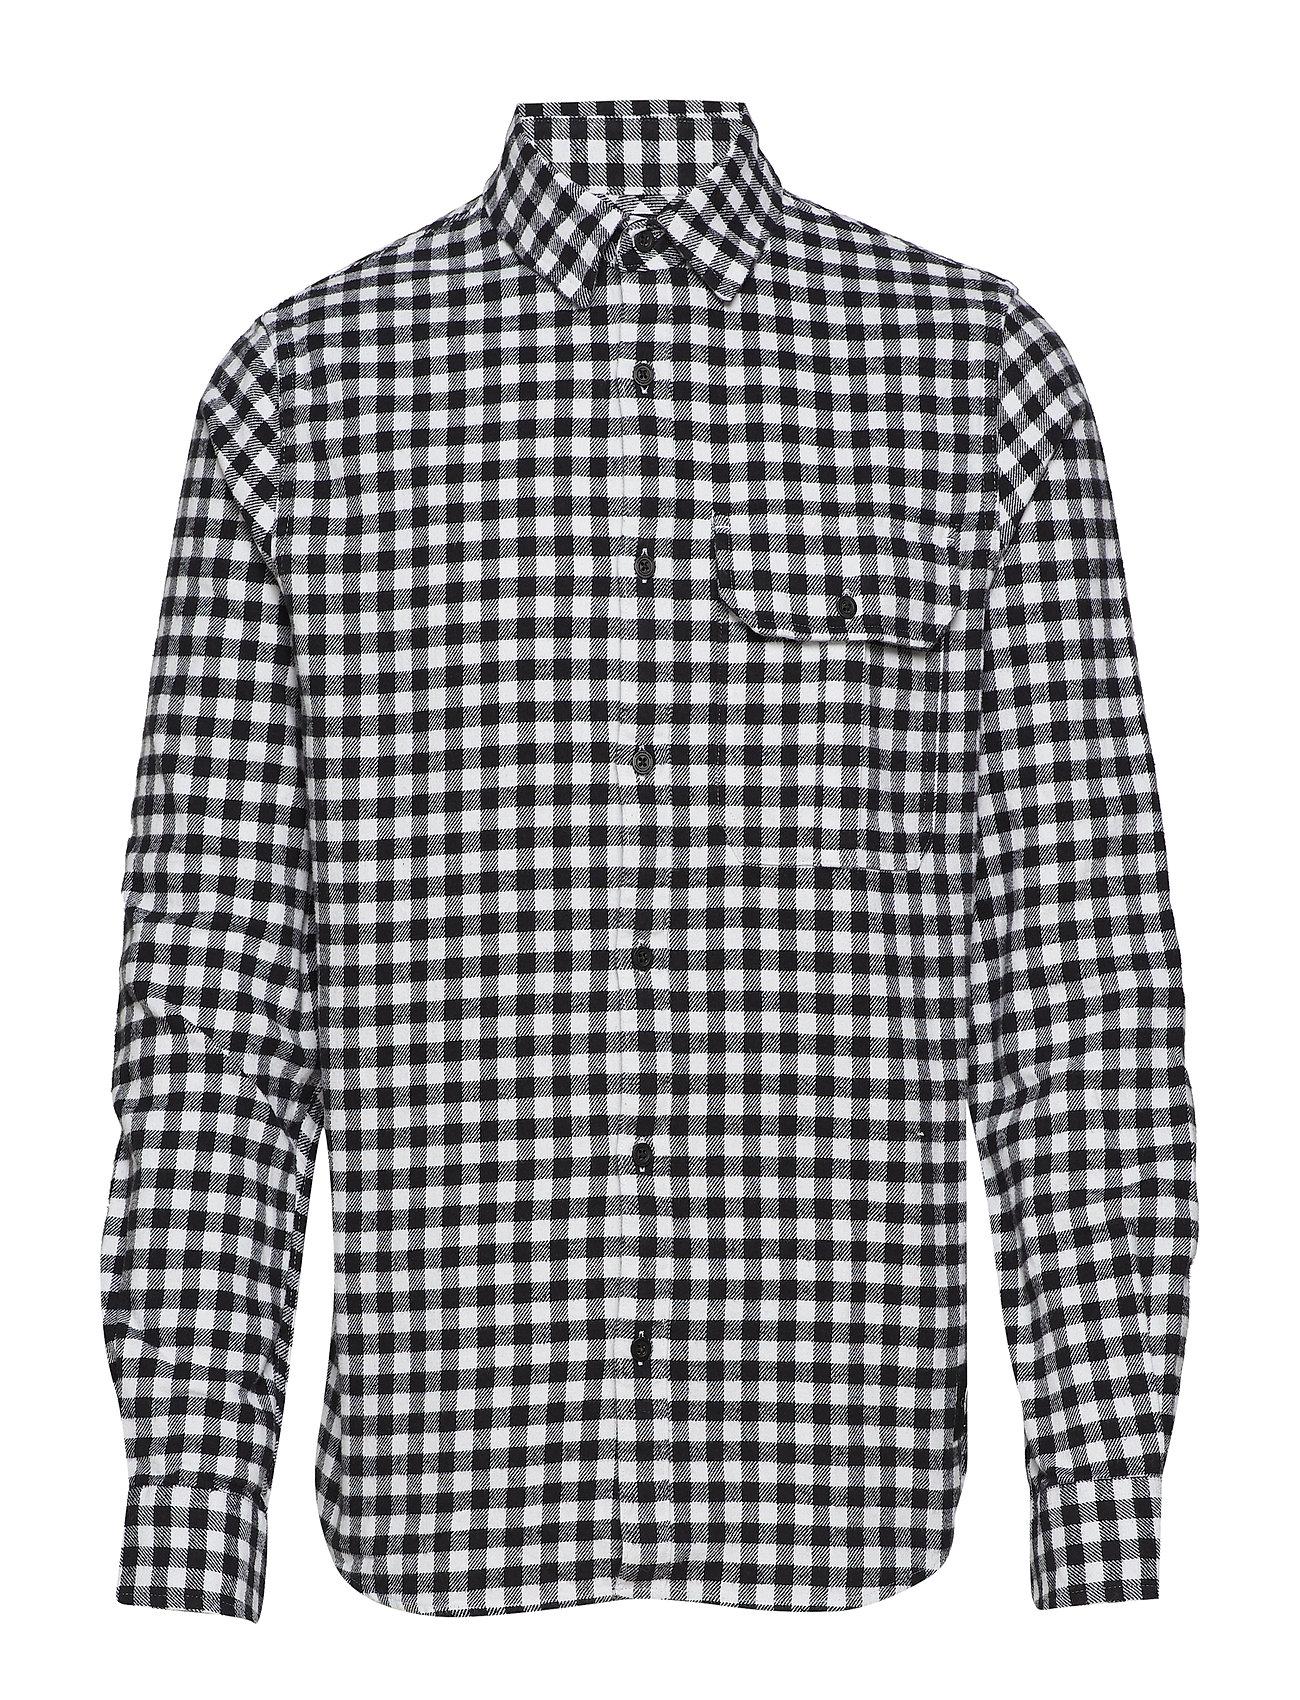 Calvin Klein Jeans GINGHAM CHECK REG FI - BRIGHT WHITE